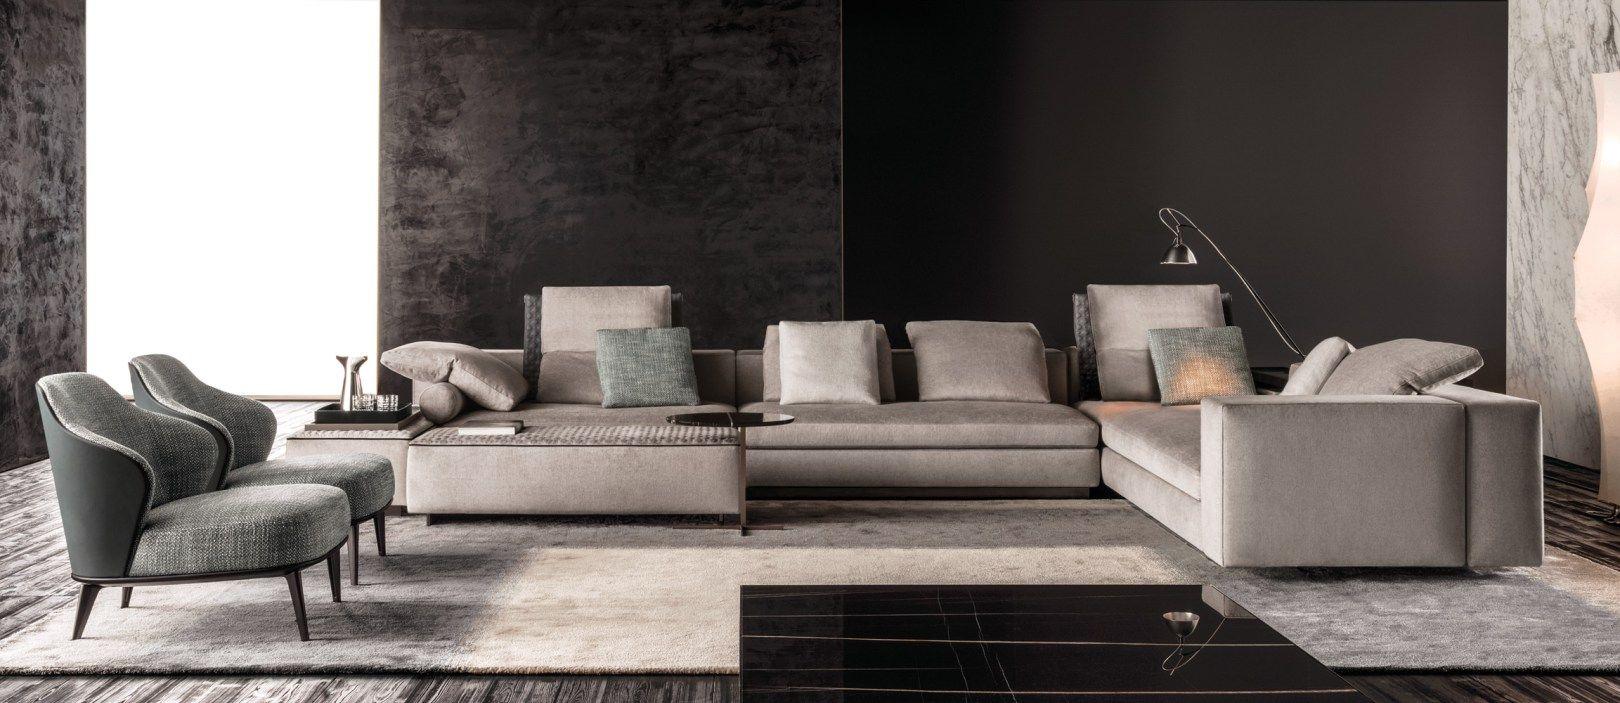 Sofa Shapes Explained Design Minotti Home